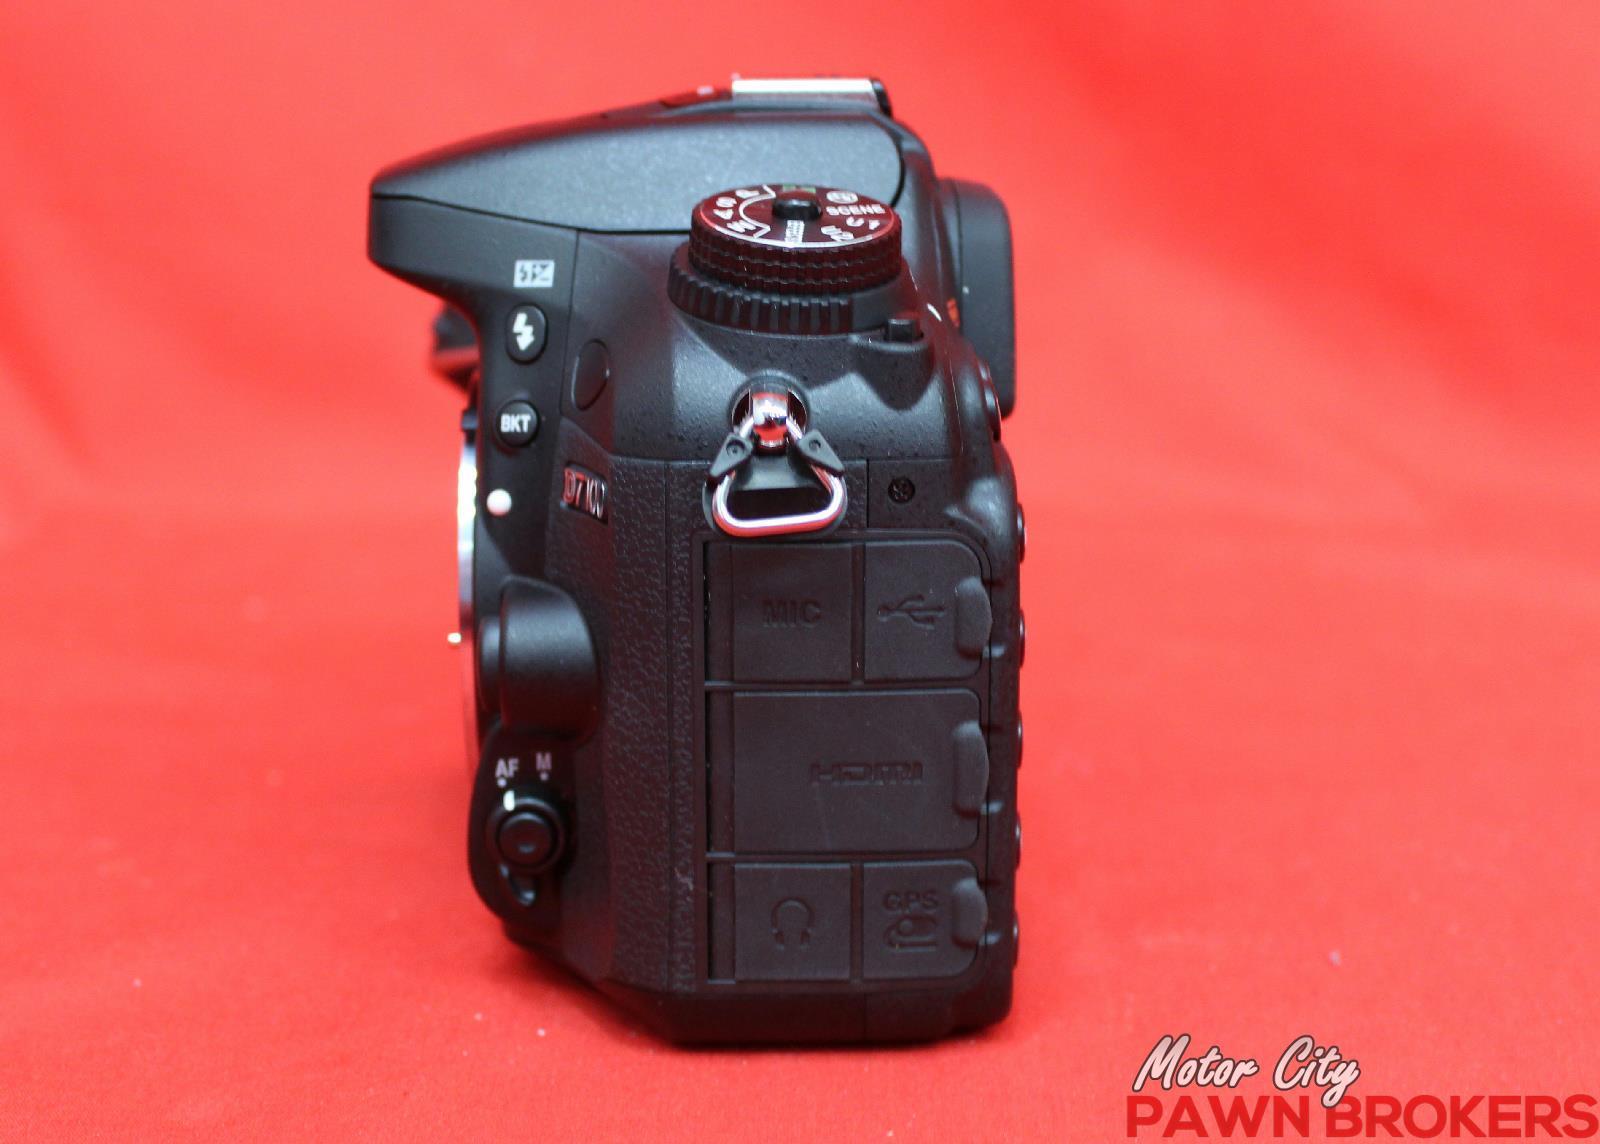 Nikon d7100 24 1 megapixels 3 2 screen sd card hdmi for Motor city pawn shop